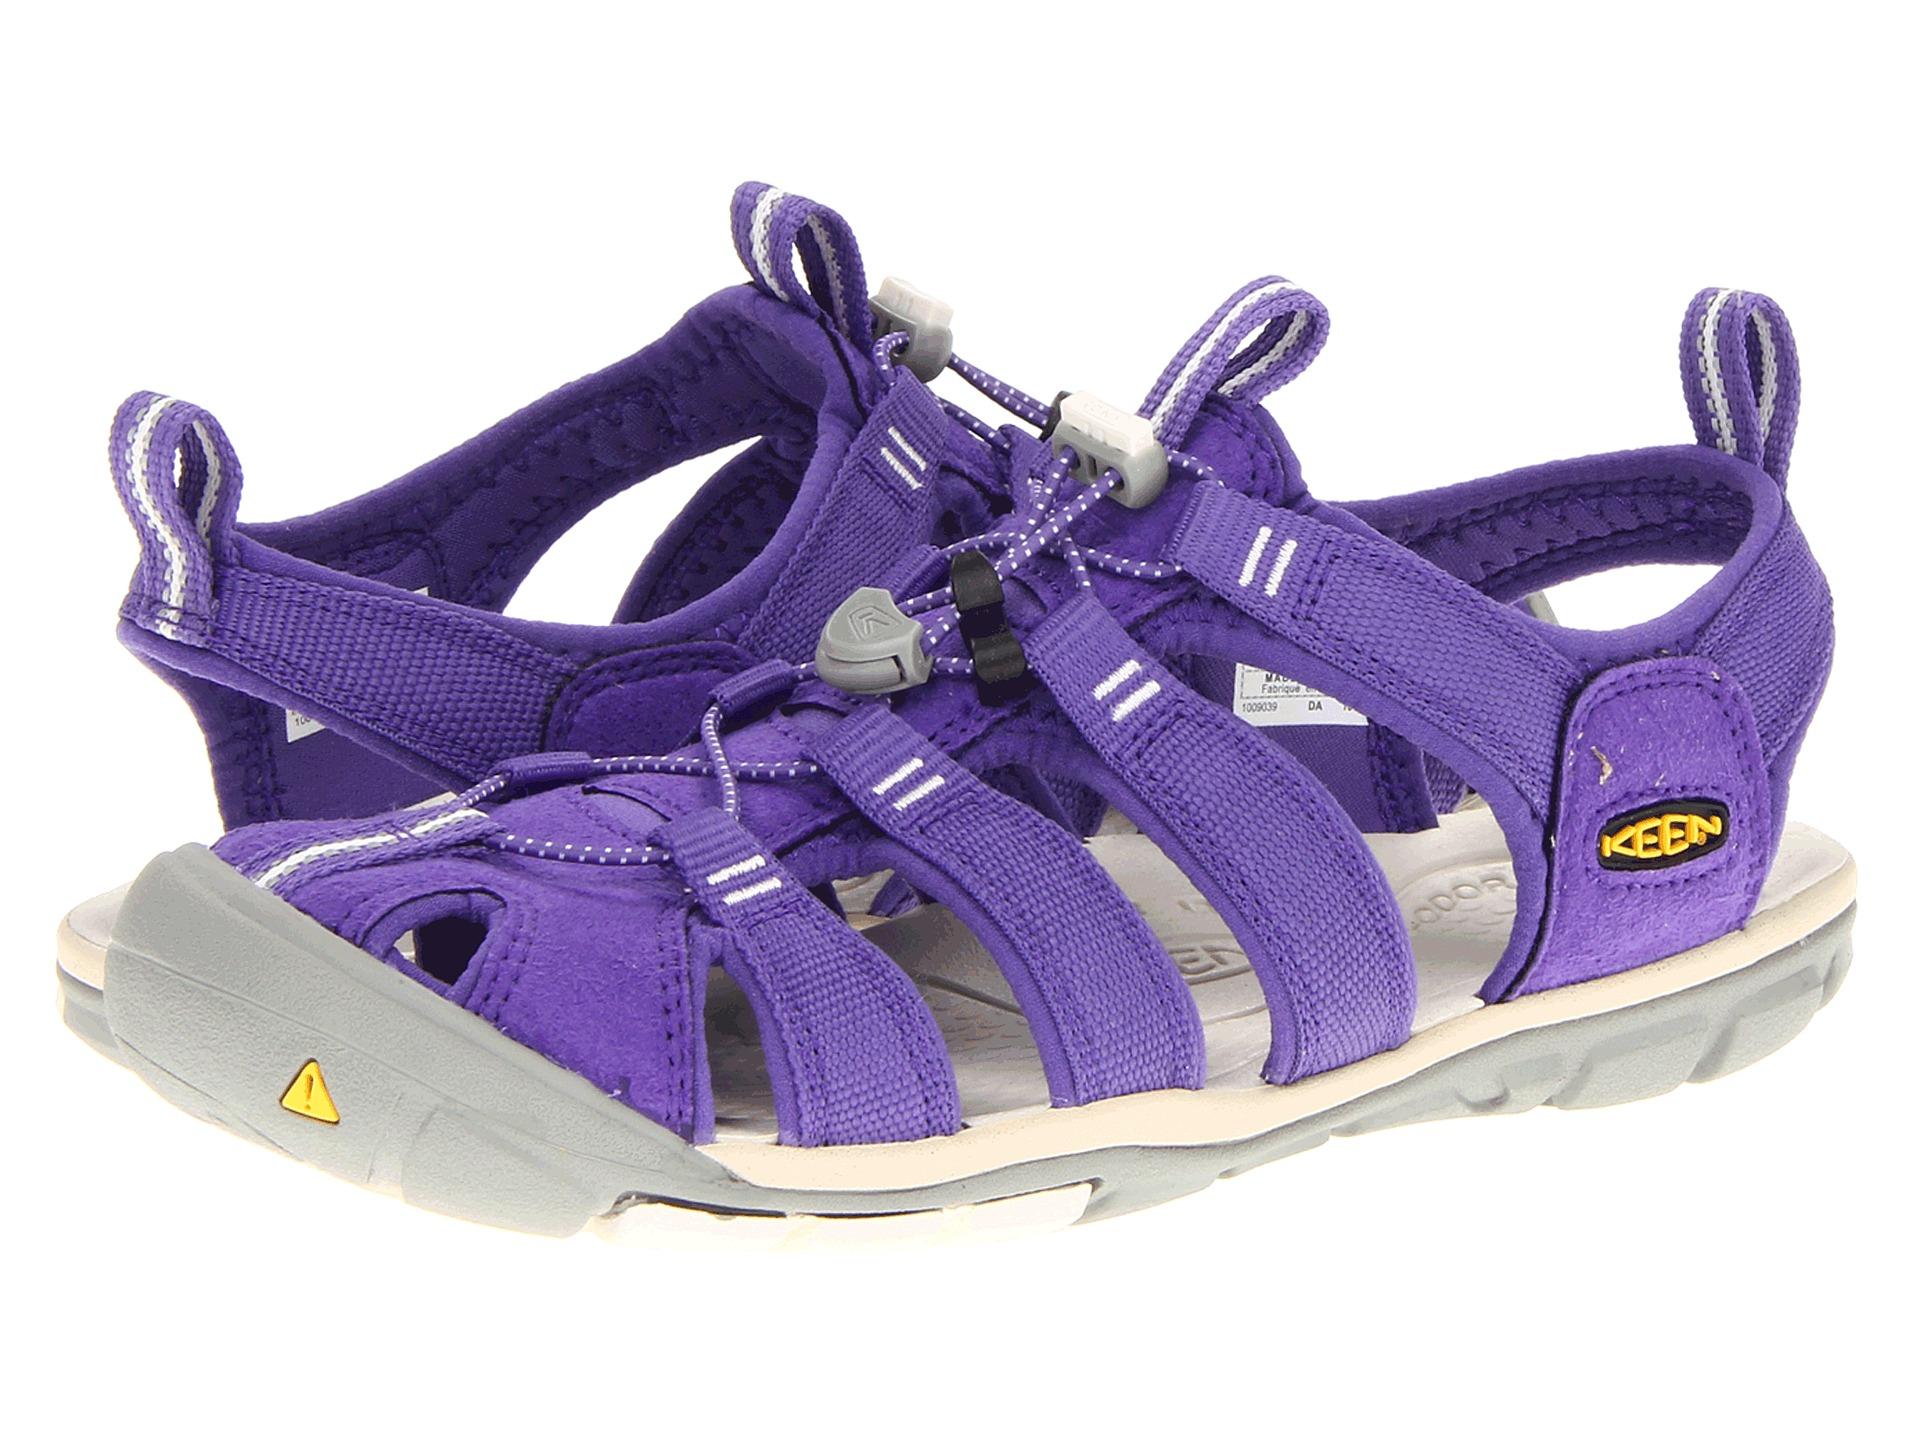 Lyst Keen Clearwater Cnx In Purple